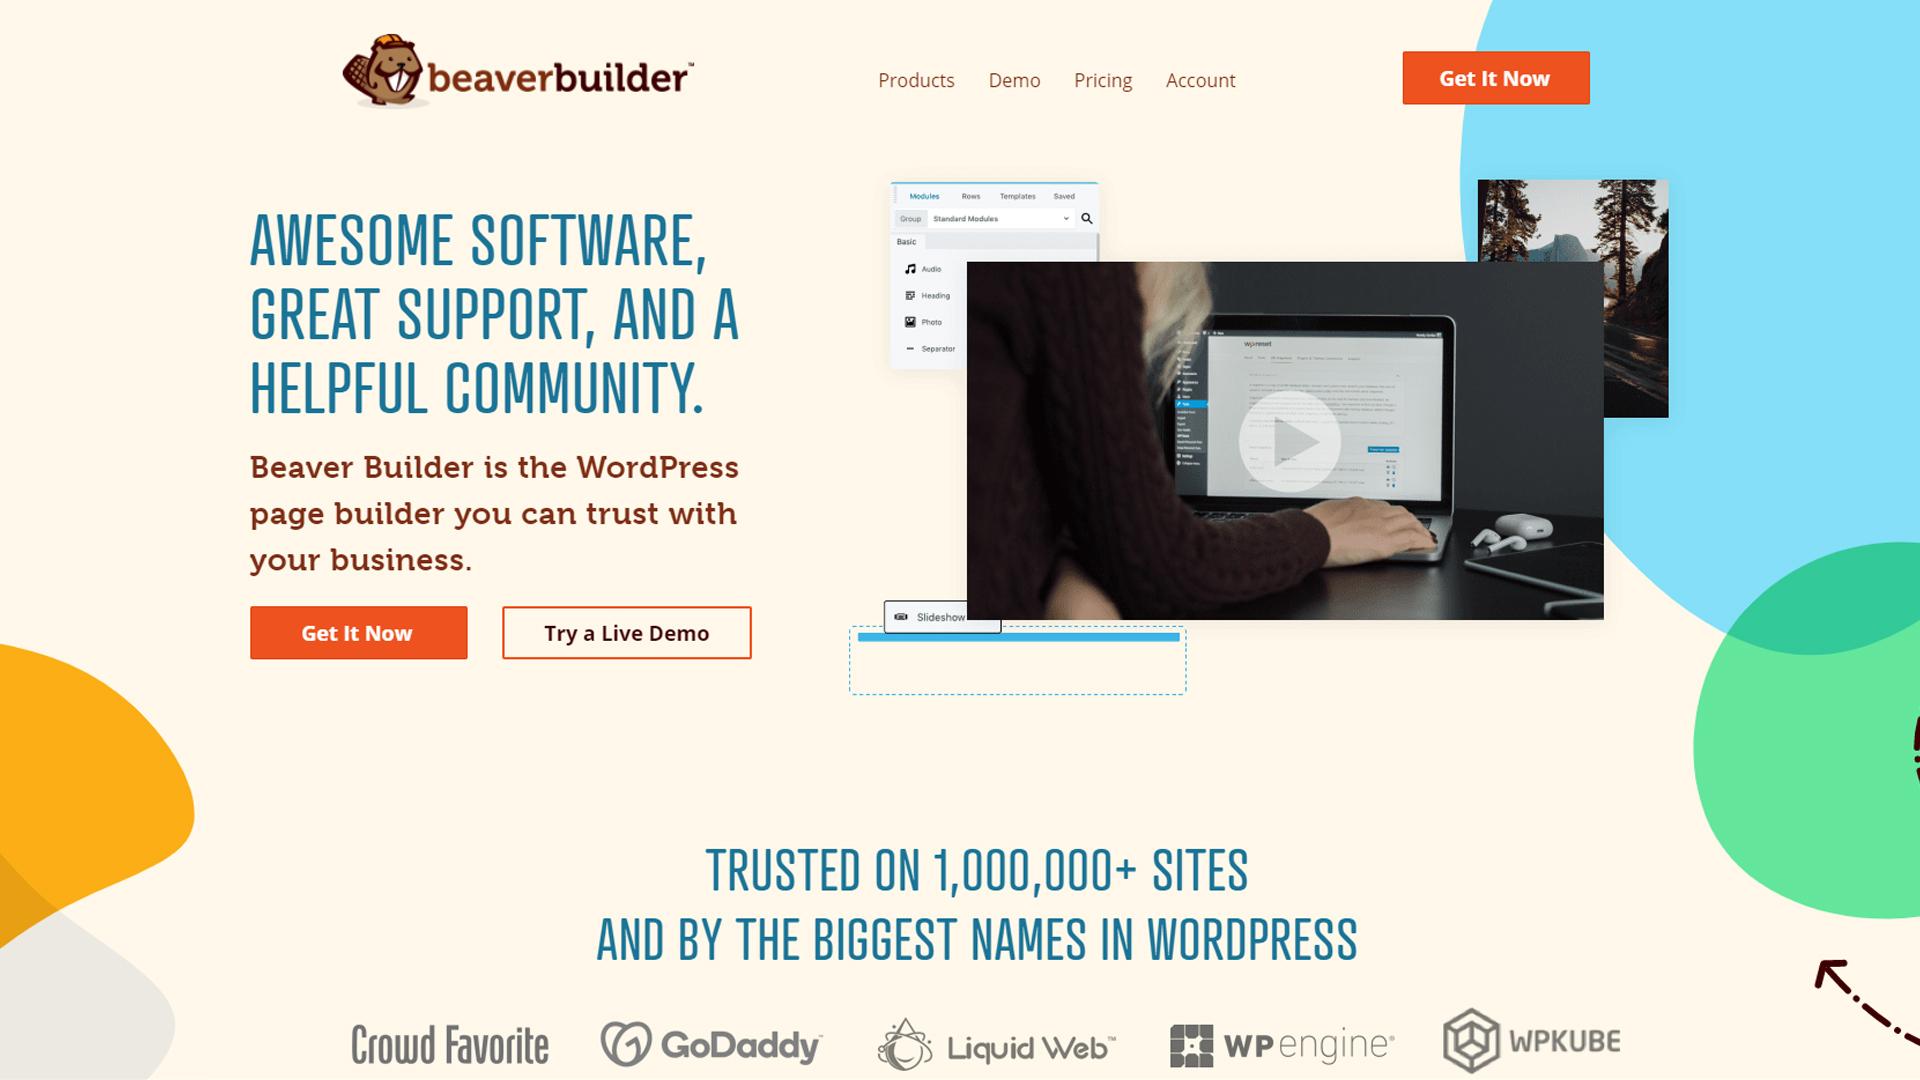 Beaver Builder's homepage